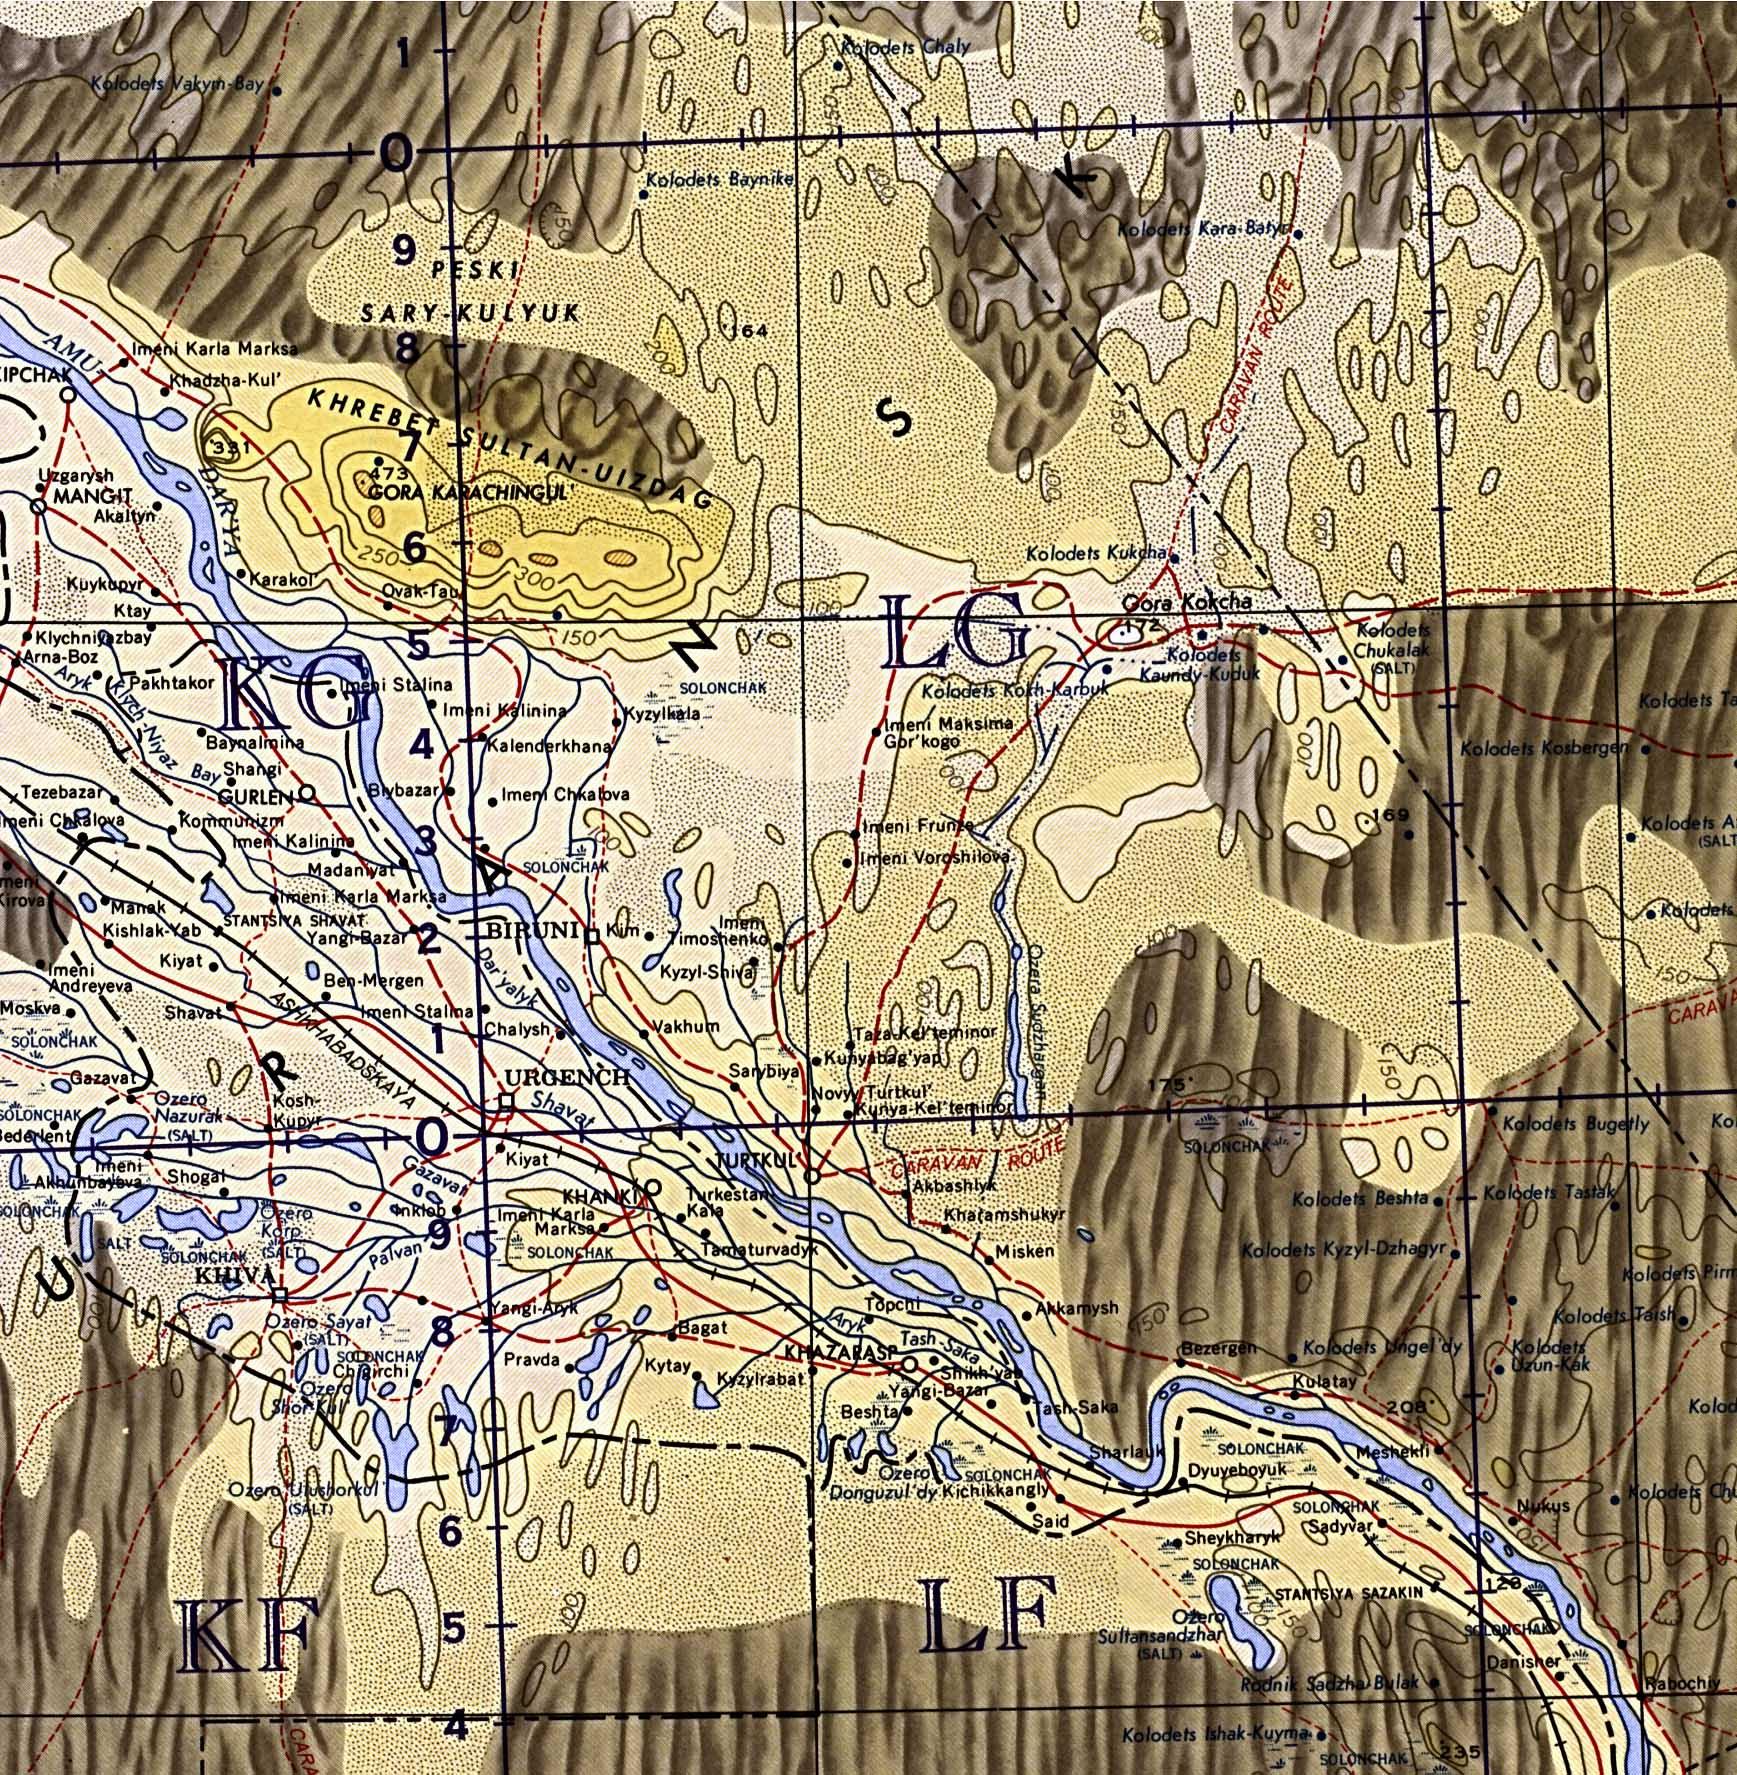 WWWVL History Index - Uzbekistan interactive map